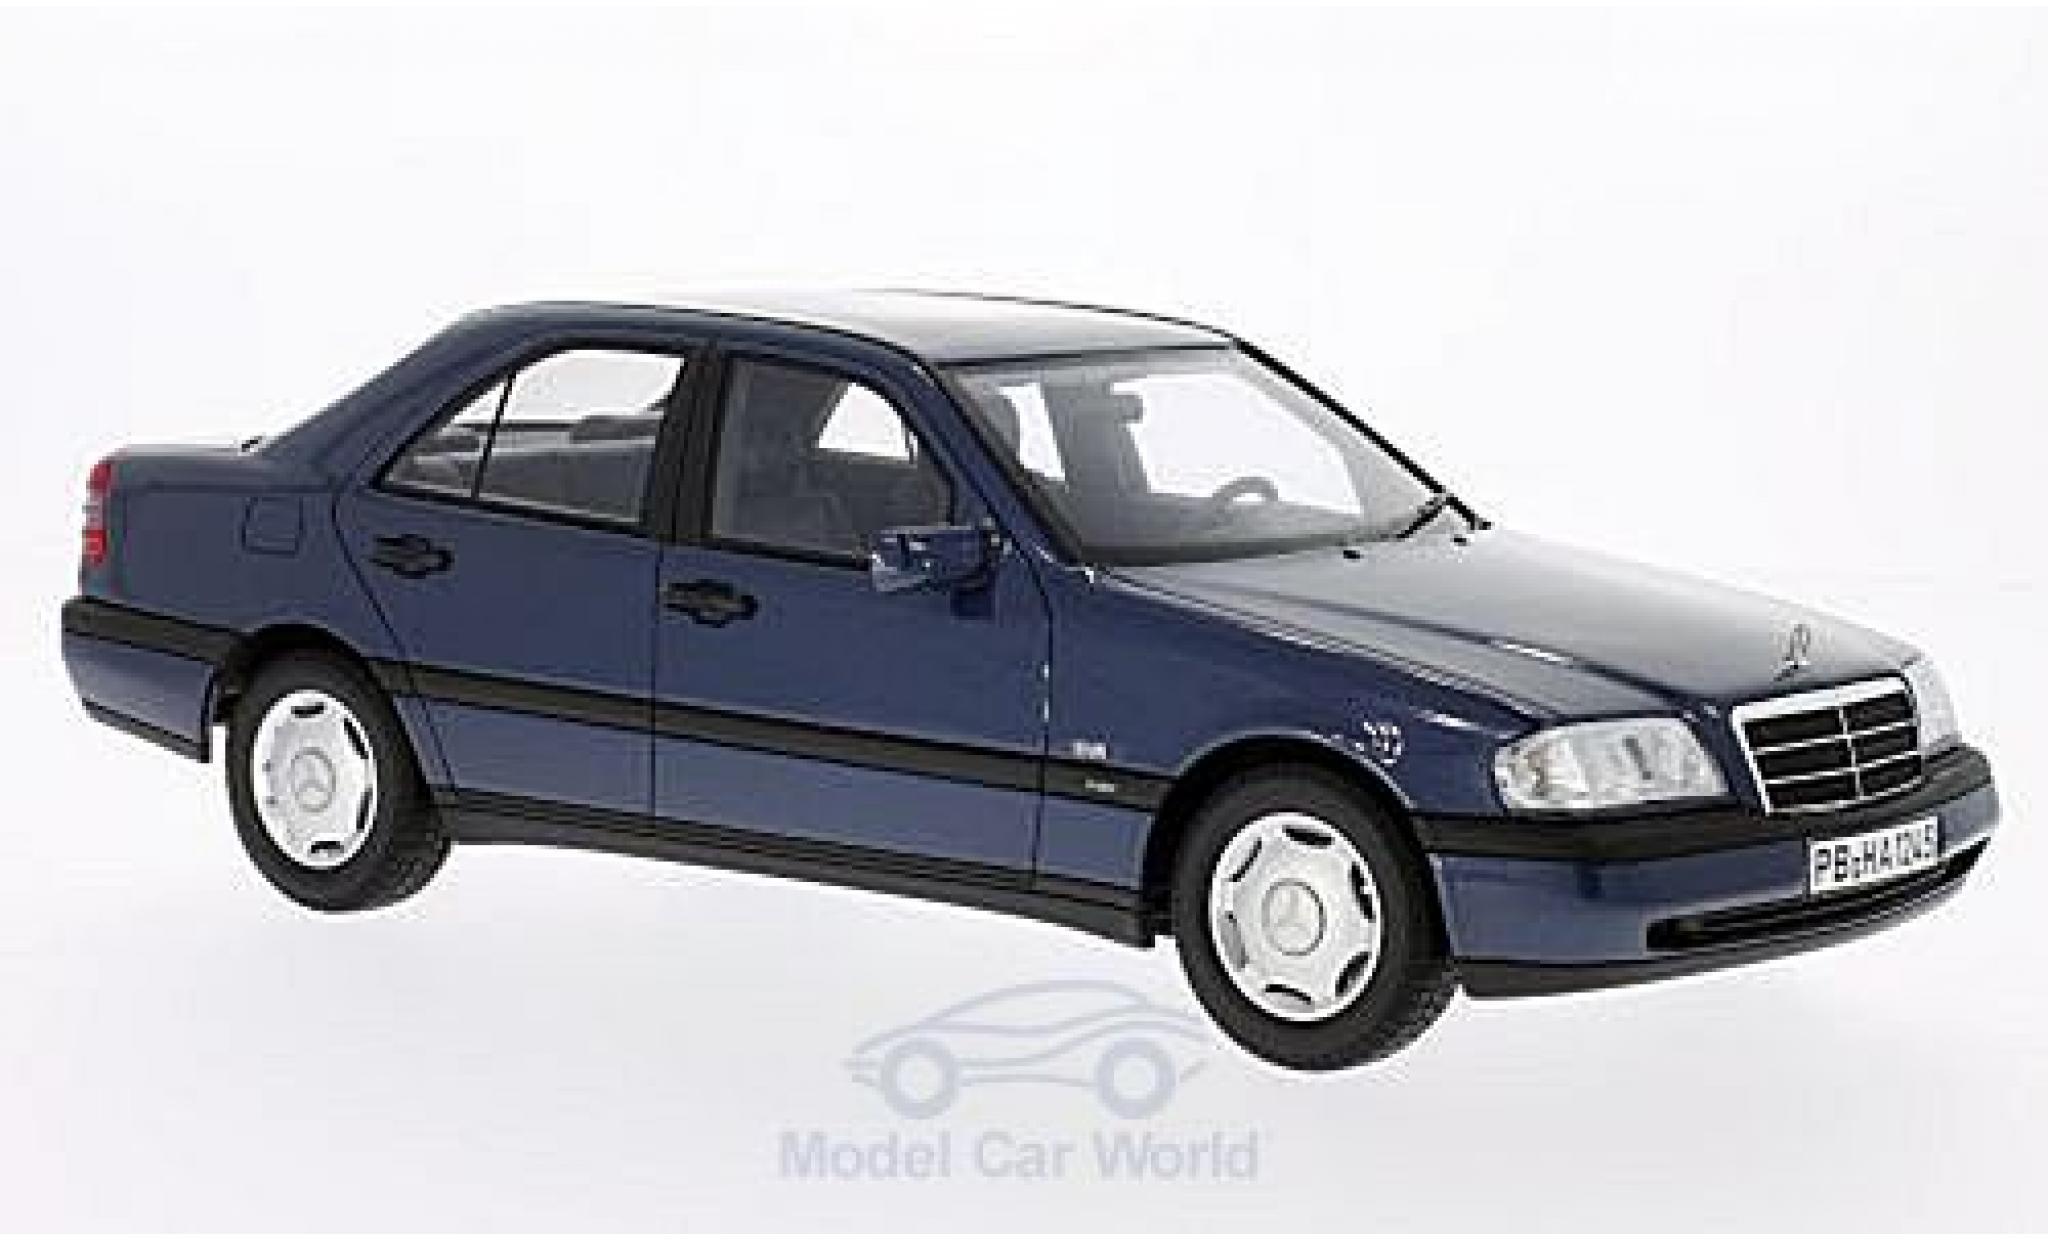 Mercedes Classe C 1/18 BoS Models C220 (W202) metallise blue 1995